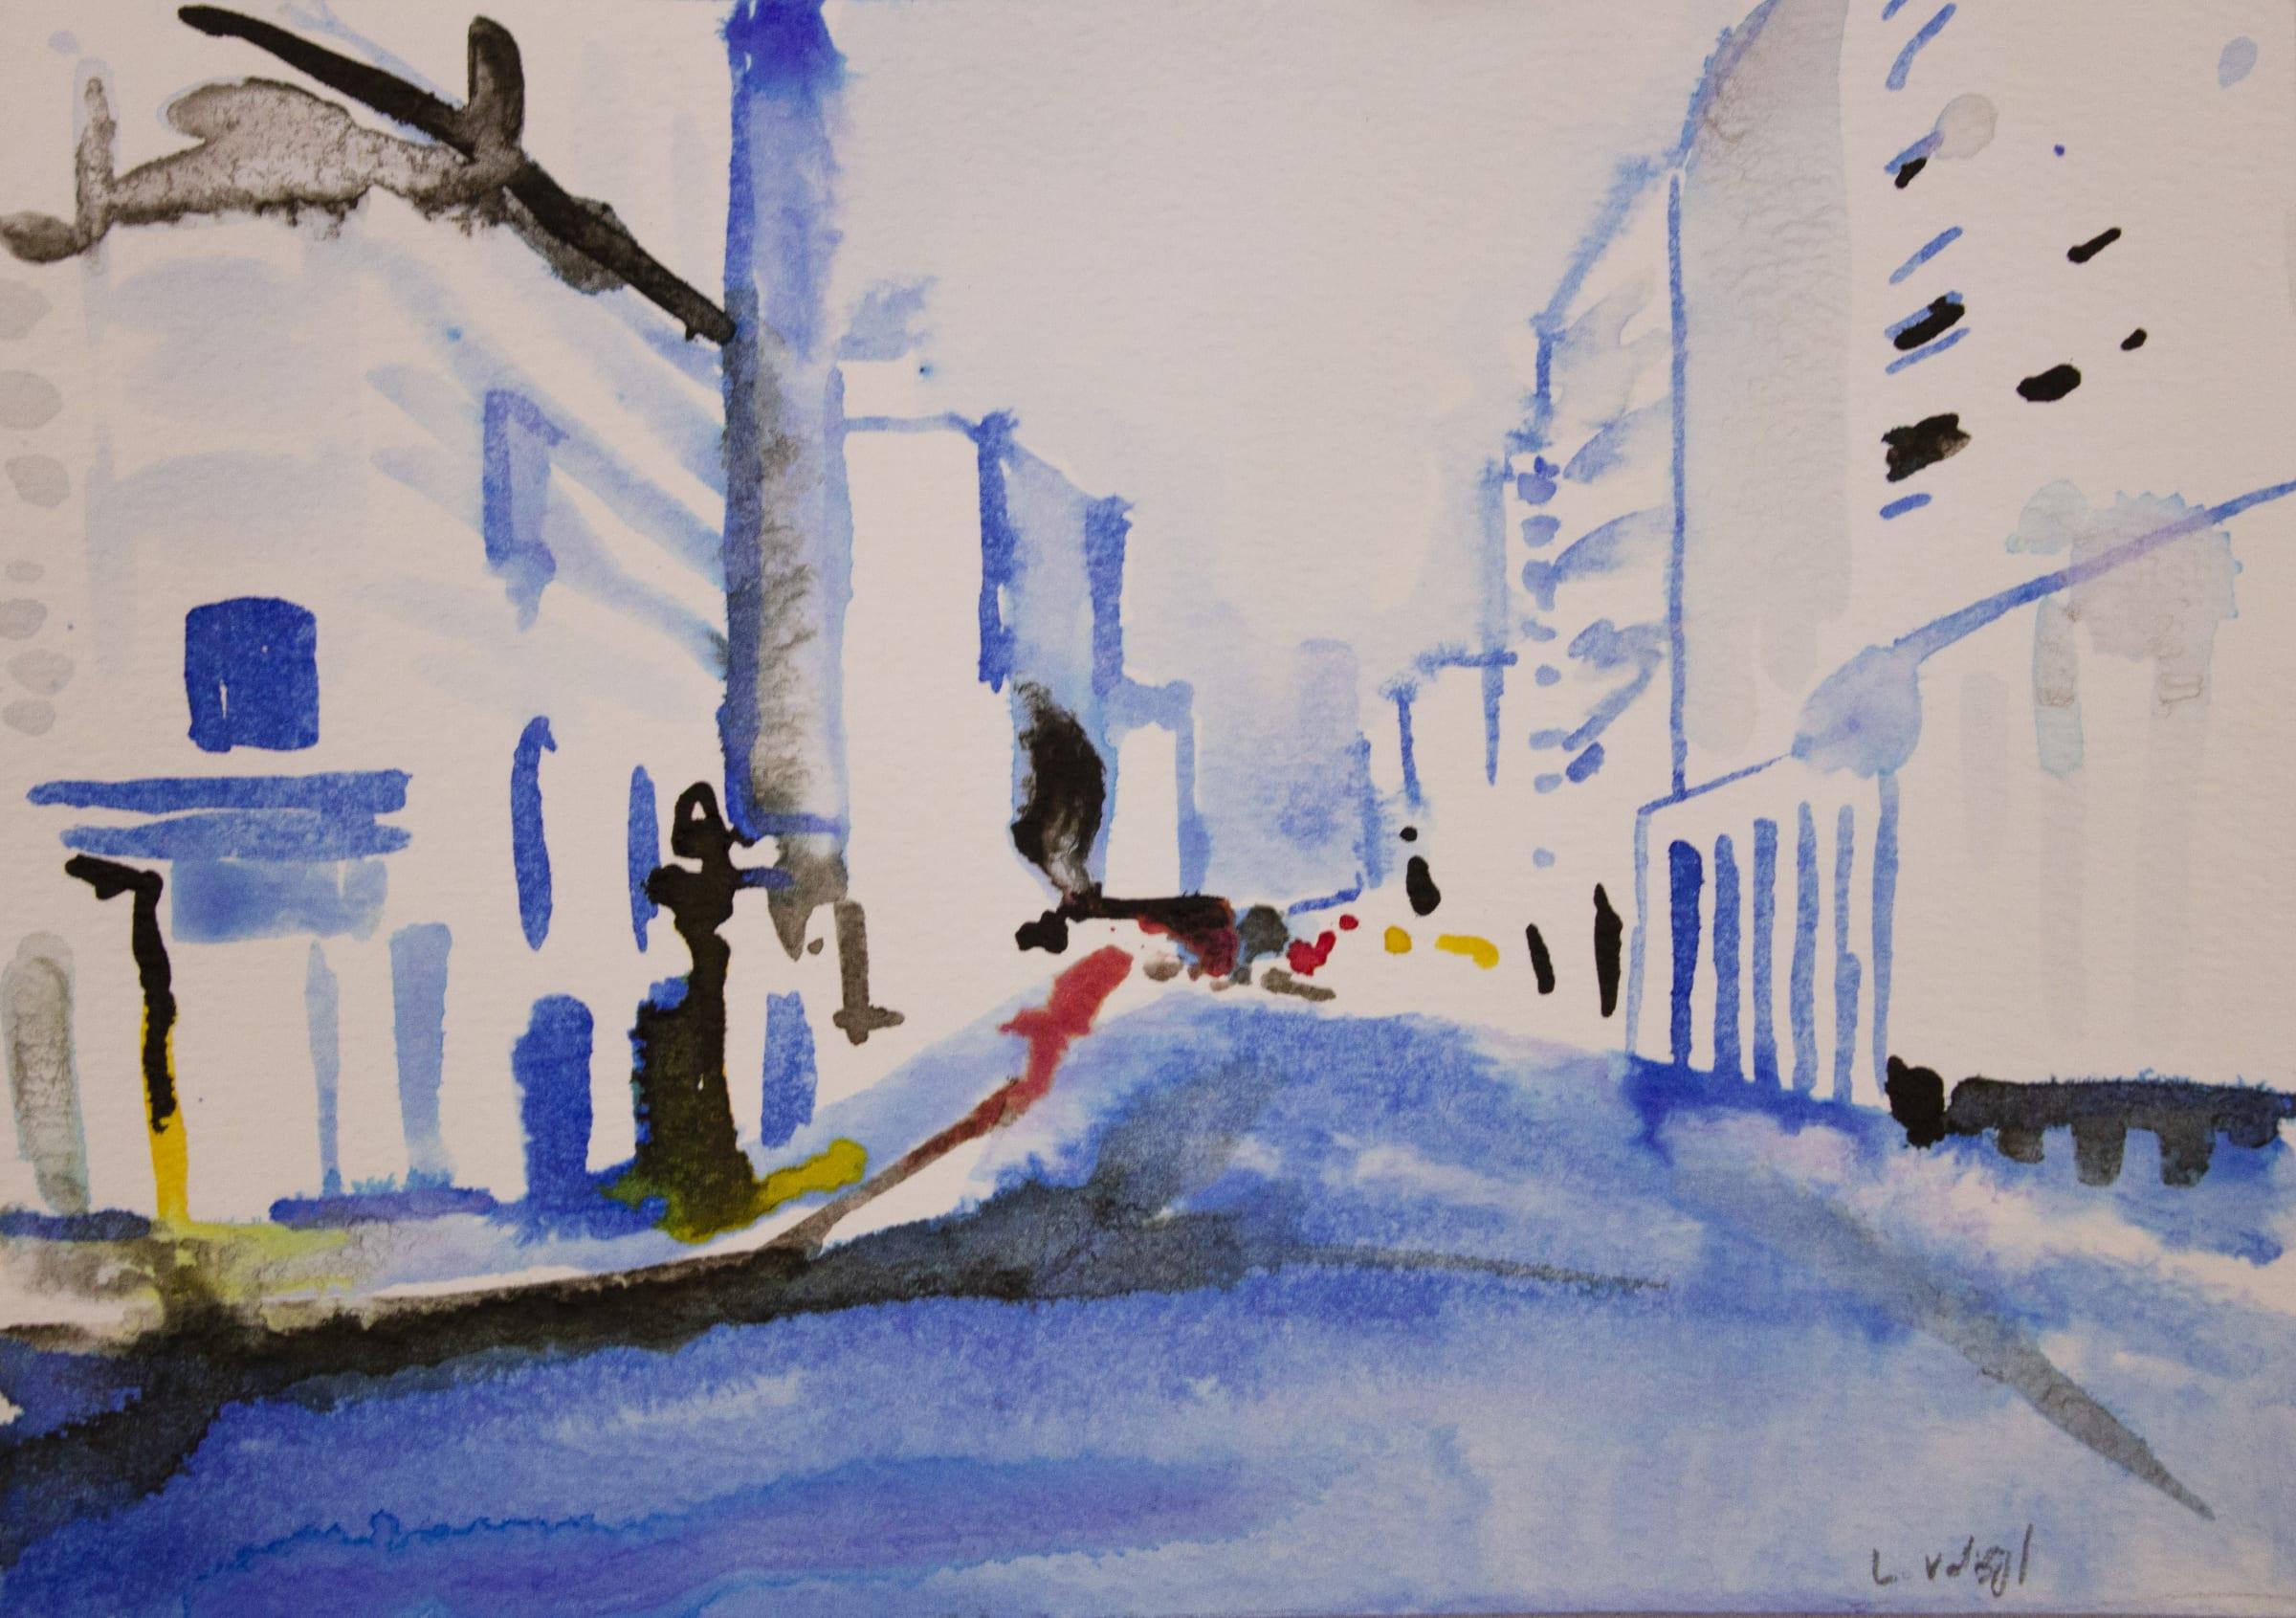 <span class=&#34;link fancybox-details-link&#34;><a href=&#34;/artists/88-louise-van-der-bijl/works/2298-louise-van-der-bijl-inktober-day-6-2018/&#34;>View Detail Page</a></span><div class=&#34;artist&#34;><strong>Louise Van Der Bijl</strong></div> <div class=&#34;title&#34;><em>Inktober Day 6</em>, 2018</div> <div class=&#34;medium&#34;>Ink On Paper</div> <div class=&#34;dimensions&#34;>15cm x 21.3cm</div><div class=&#34;price&#34;>R400.00</div>